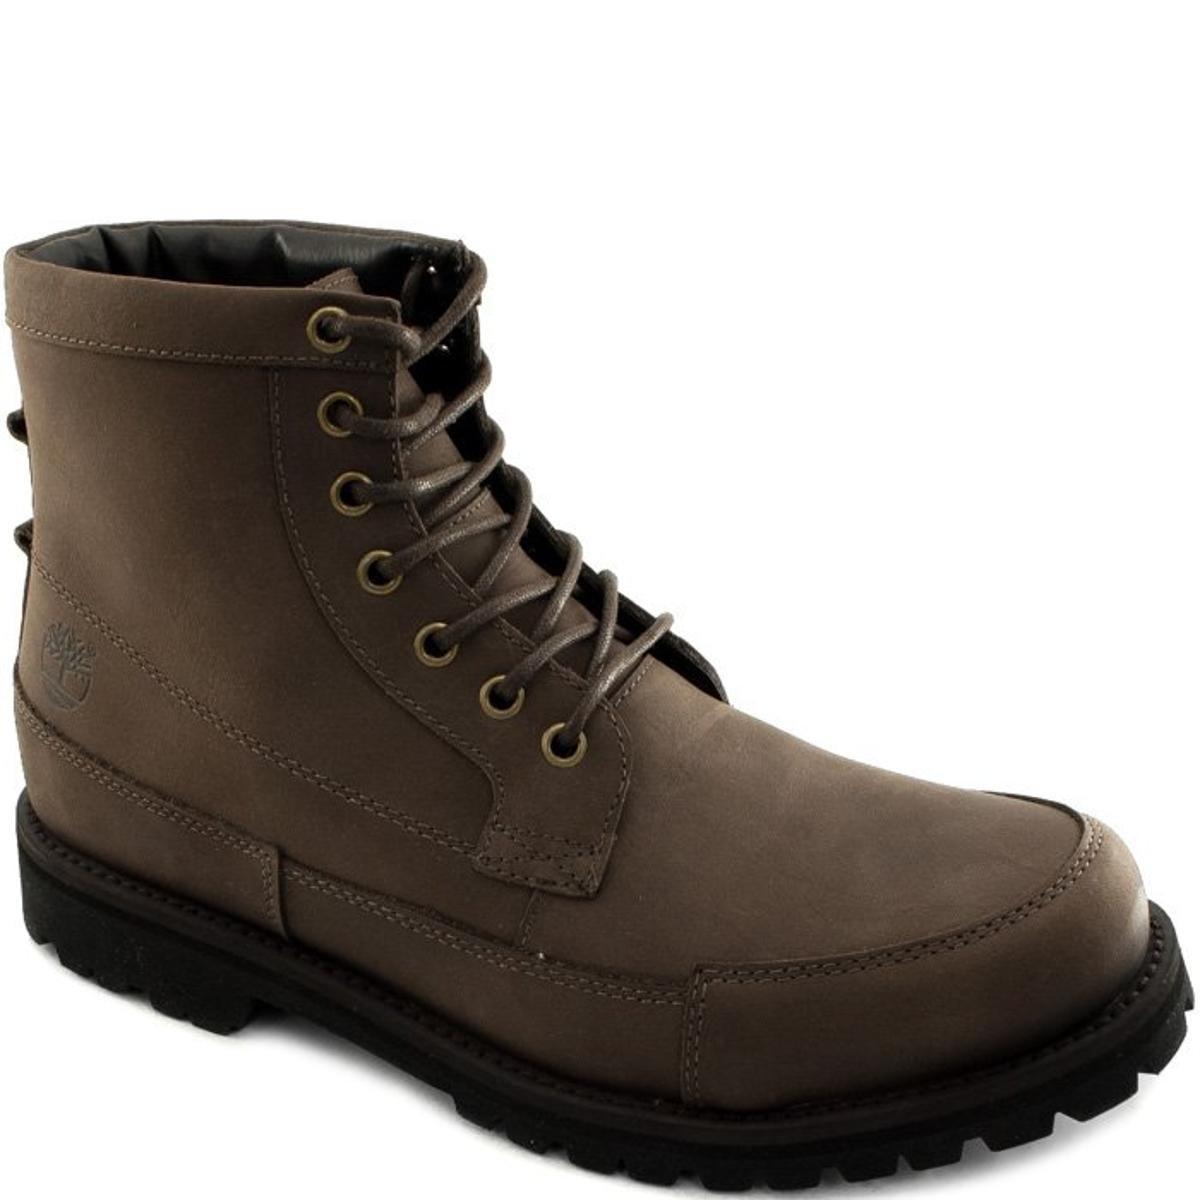 Bota Timberland Original Leather High Masculino - Marrom - Compre Agora  0133b9c51b4